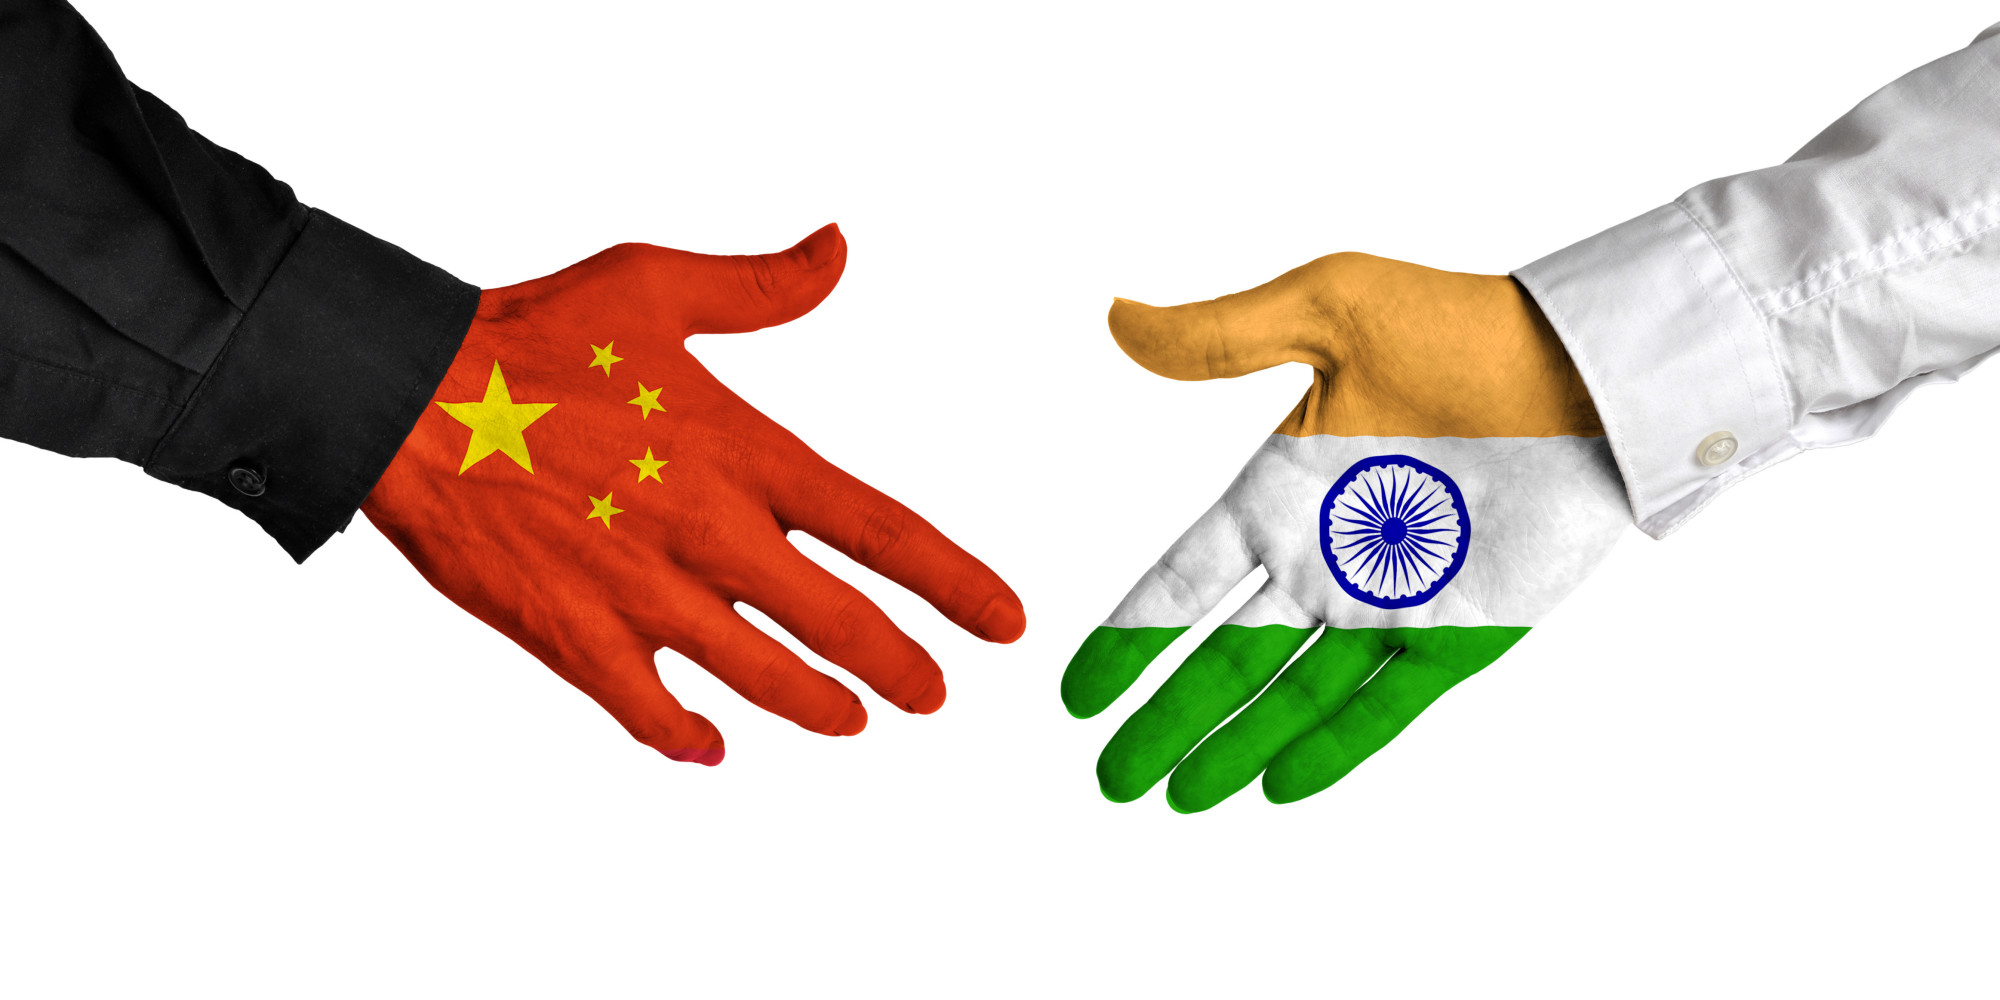 indias neighbourly relations Mercenary us over neighbourly iran mk bhadrakumar in kashmir, one man's small hopes barkha dutt reform norms, not islam anita pratap a tale of two world cups.